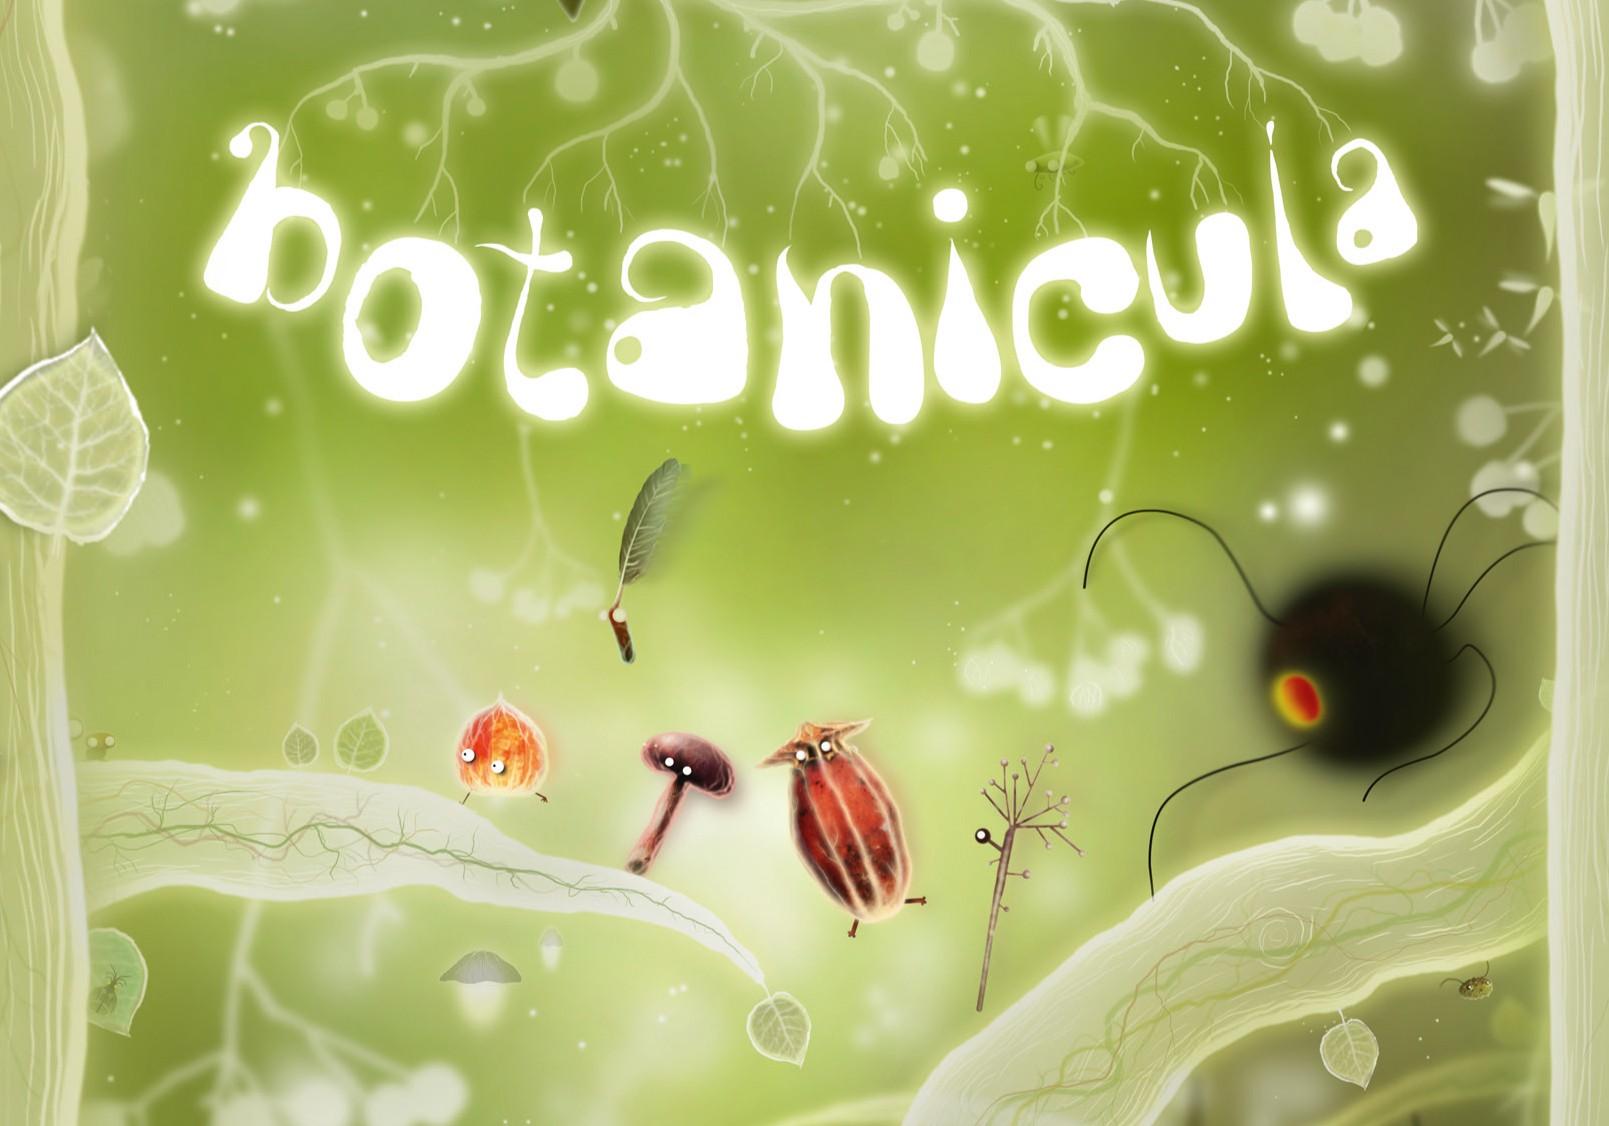 Botanicula – Entdecke das Spiel